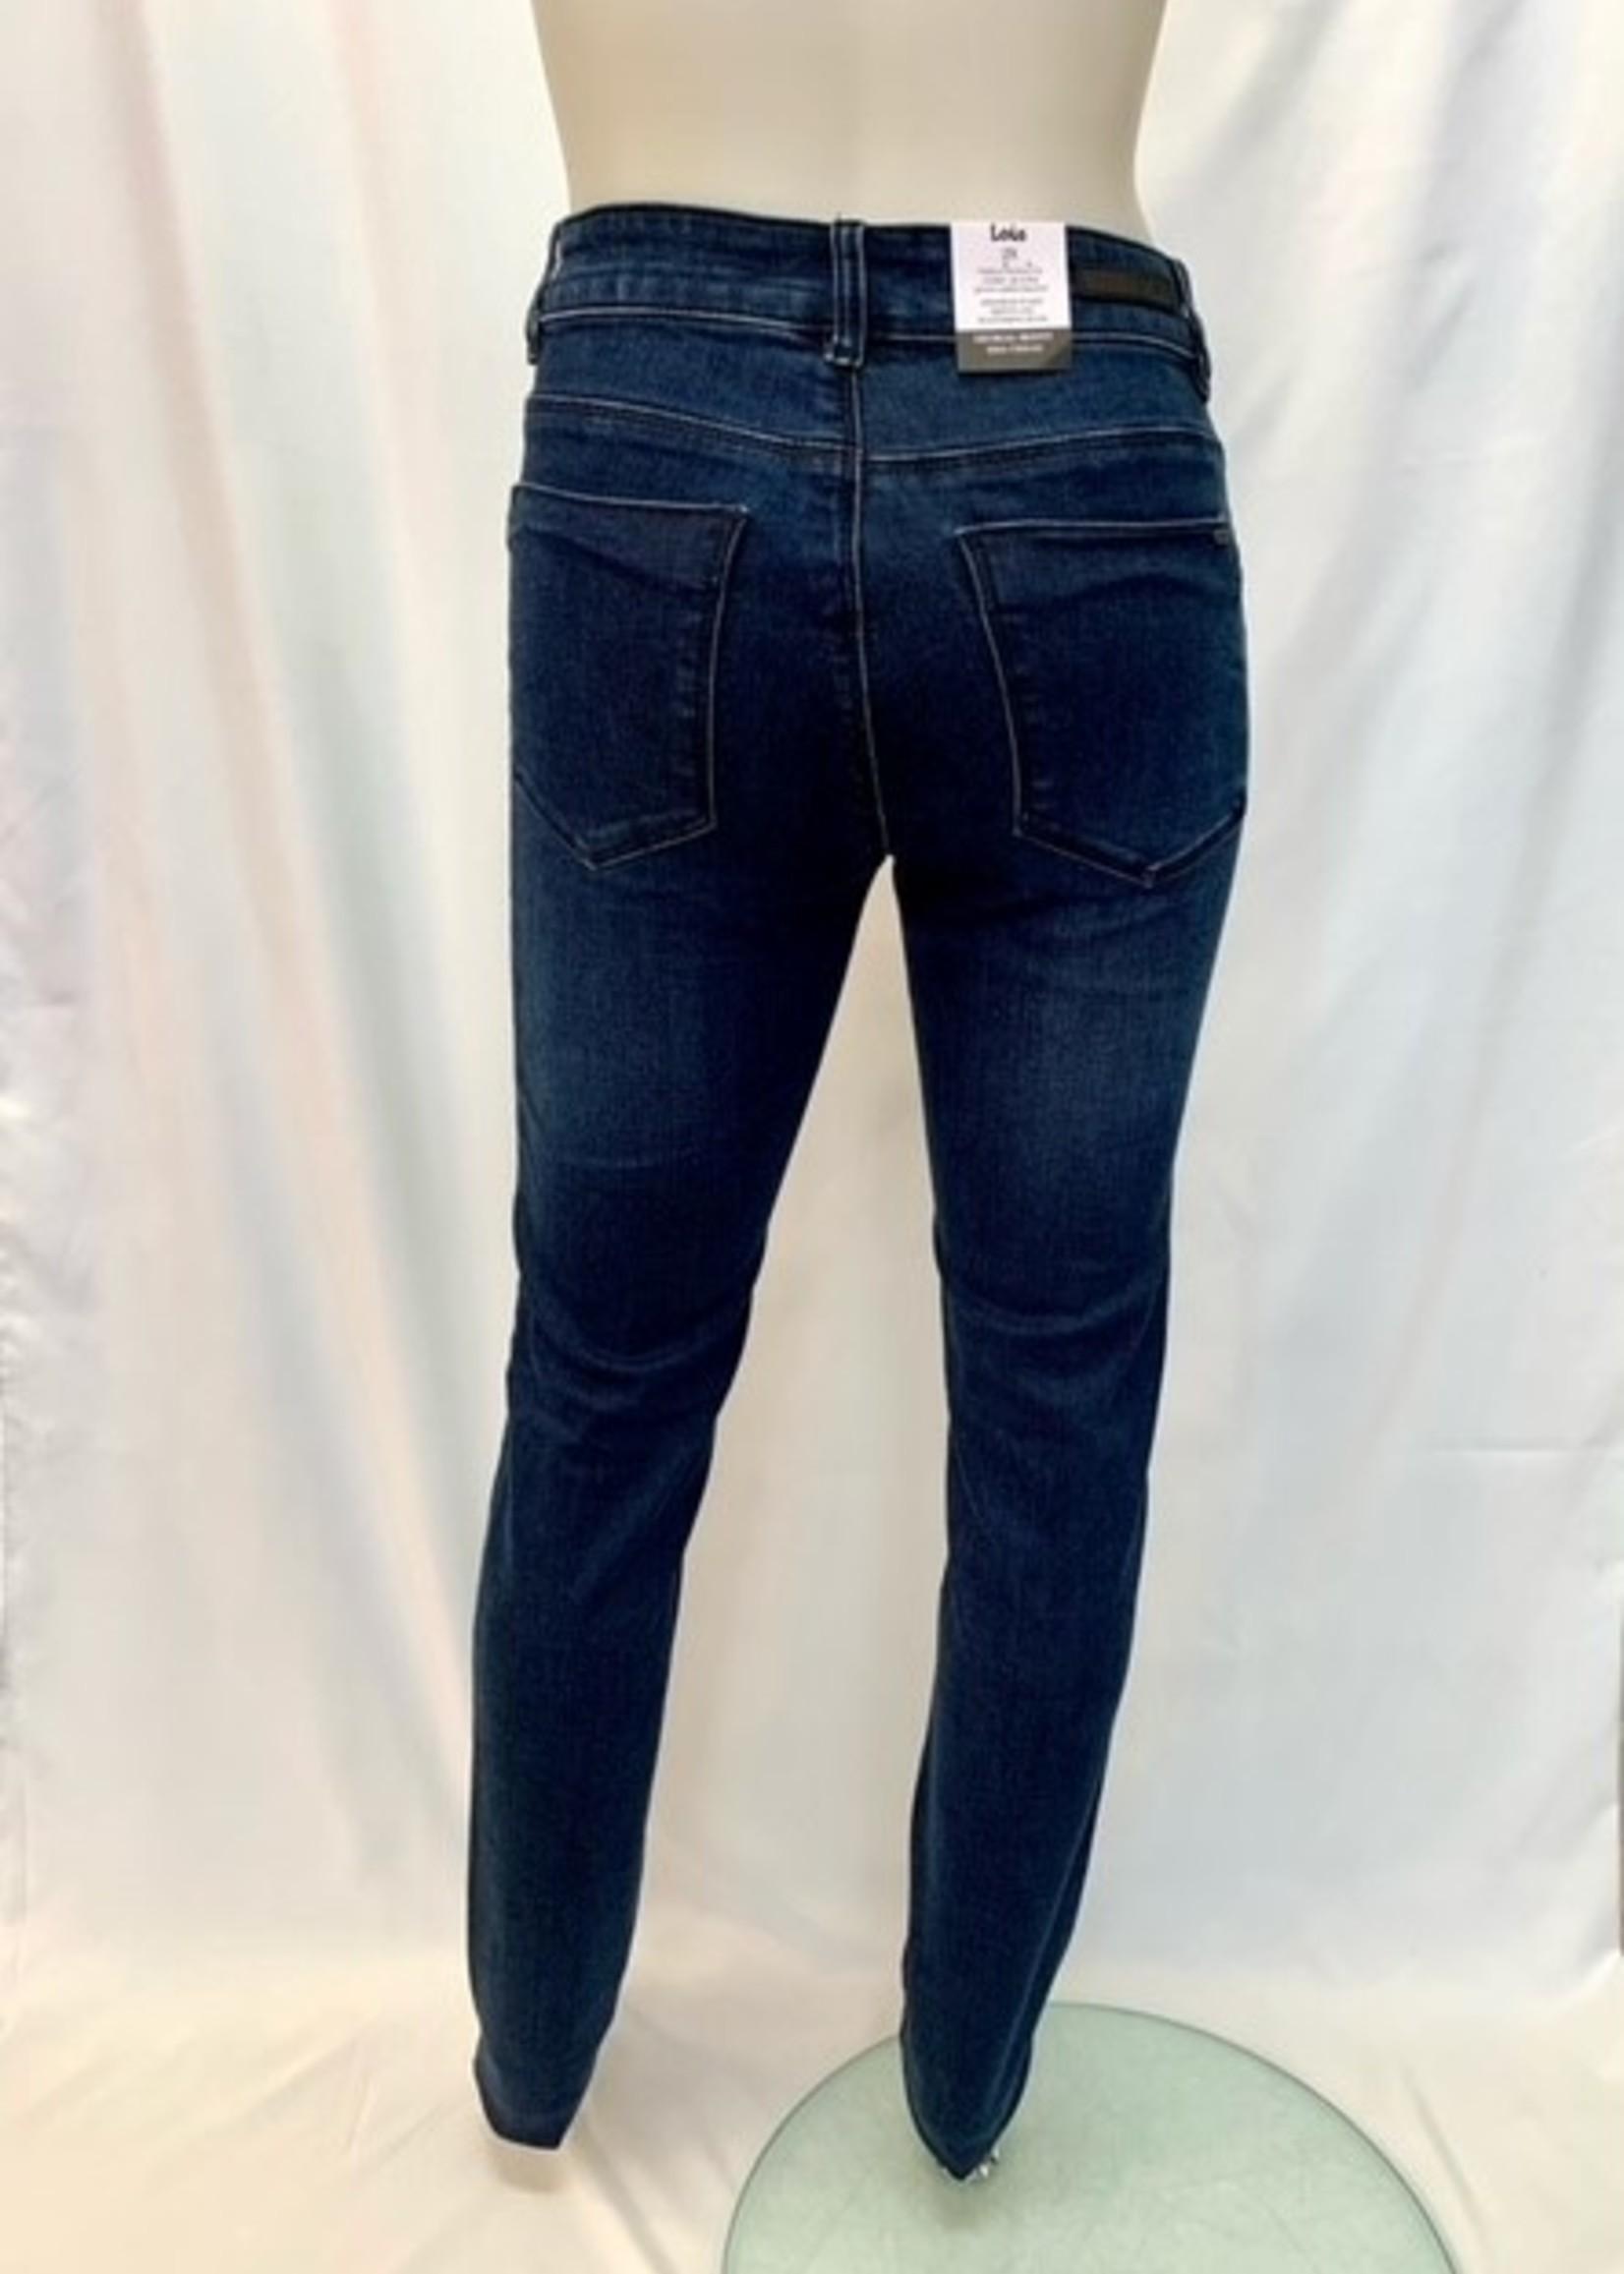 Lois Erika straight high waist